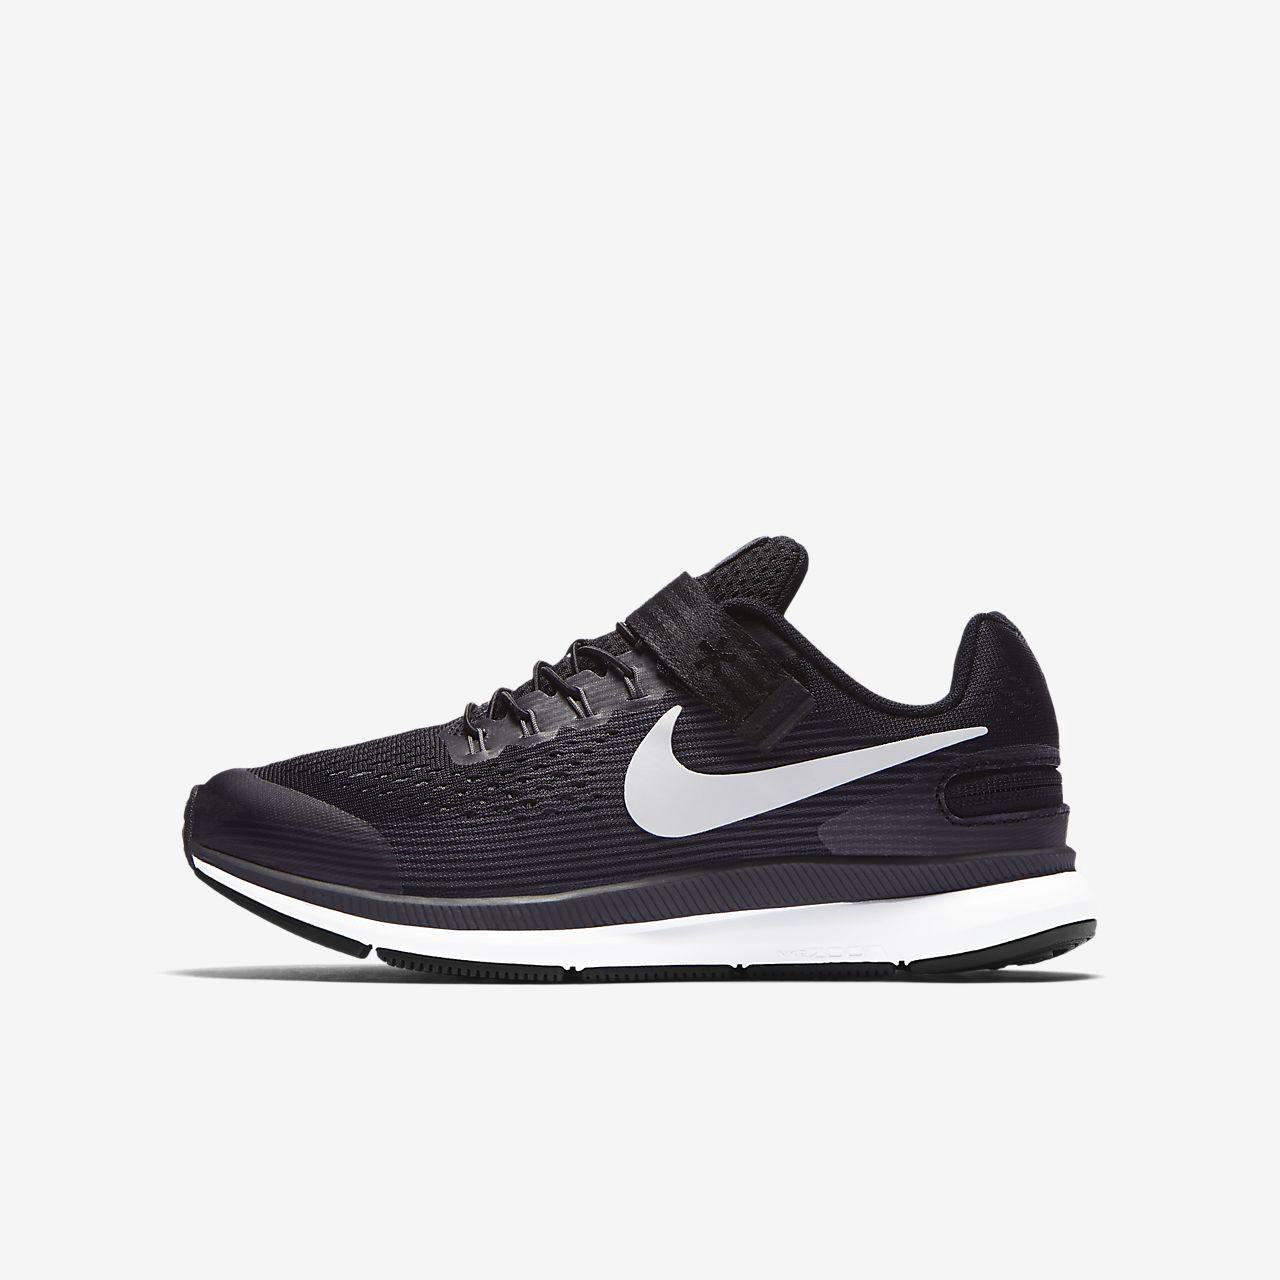 Nike Zoom Pegasus 34 FlyEase Big Kids  Running Shoe (Extra-Wide) by ... 8ae1651ff51f